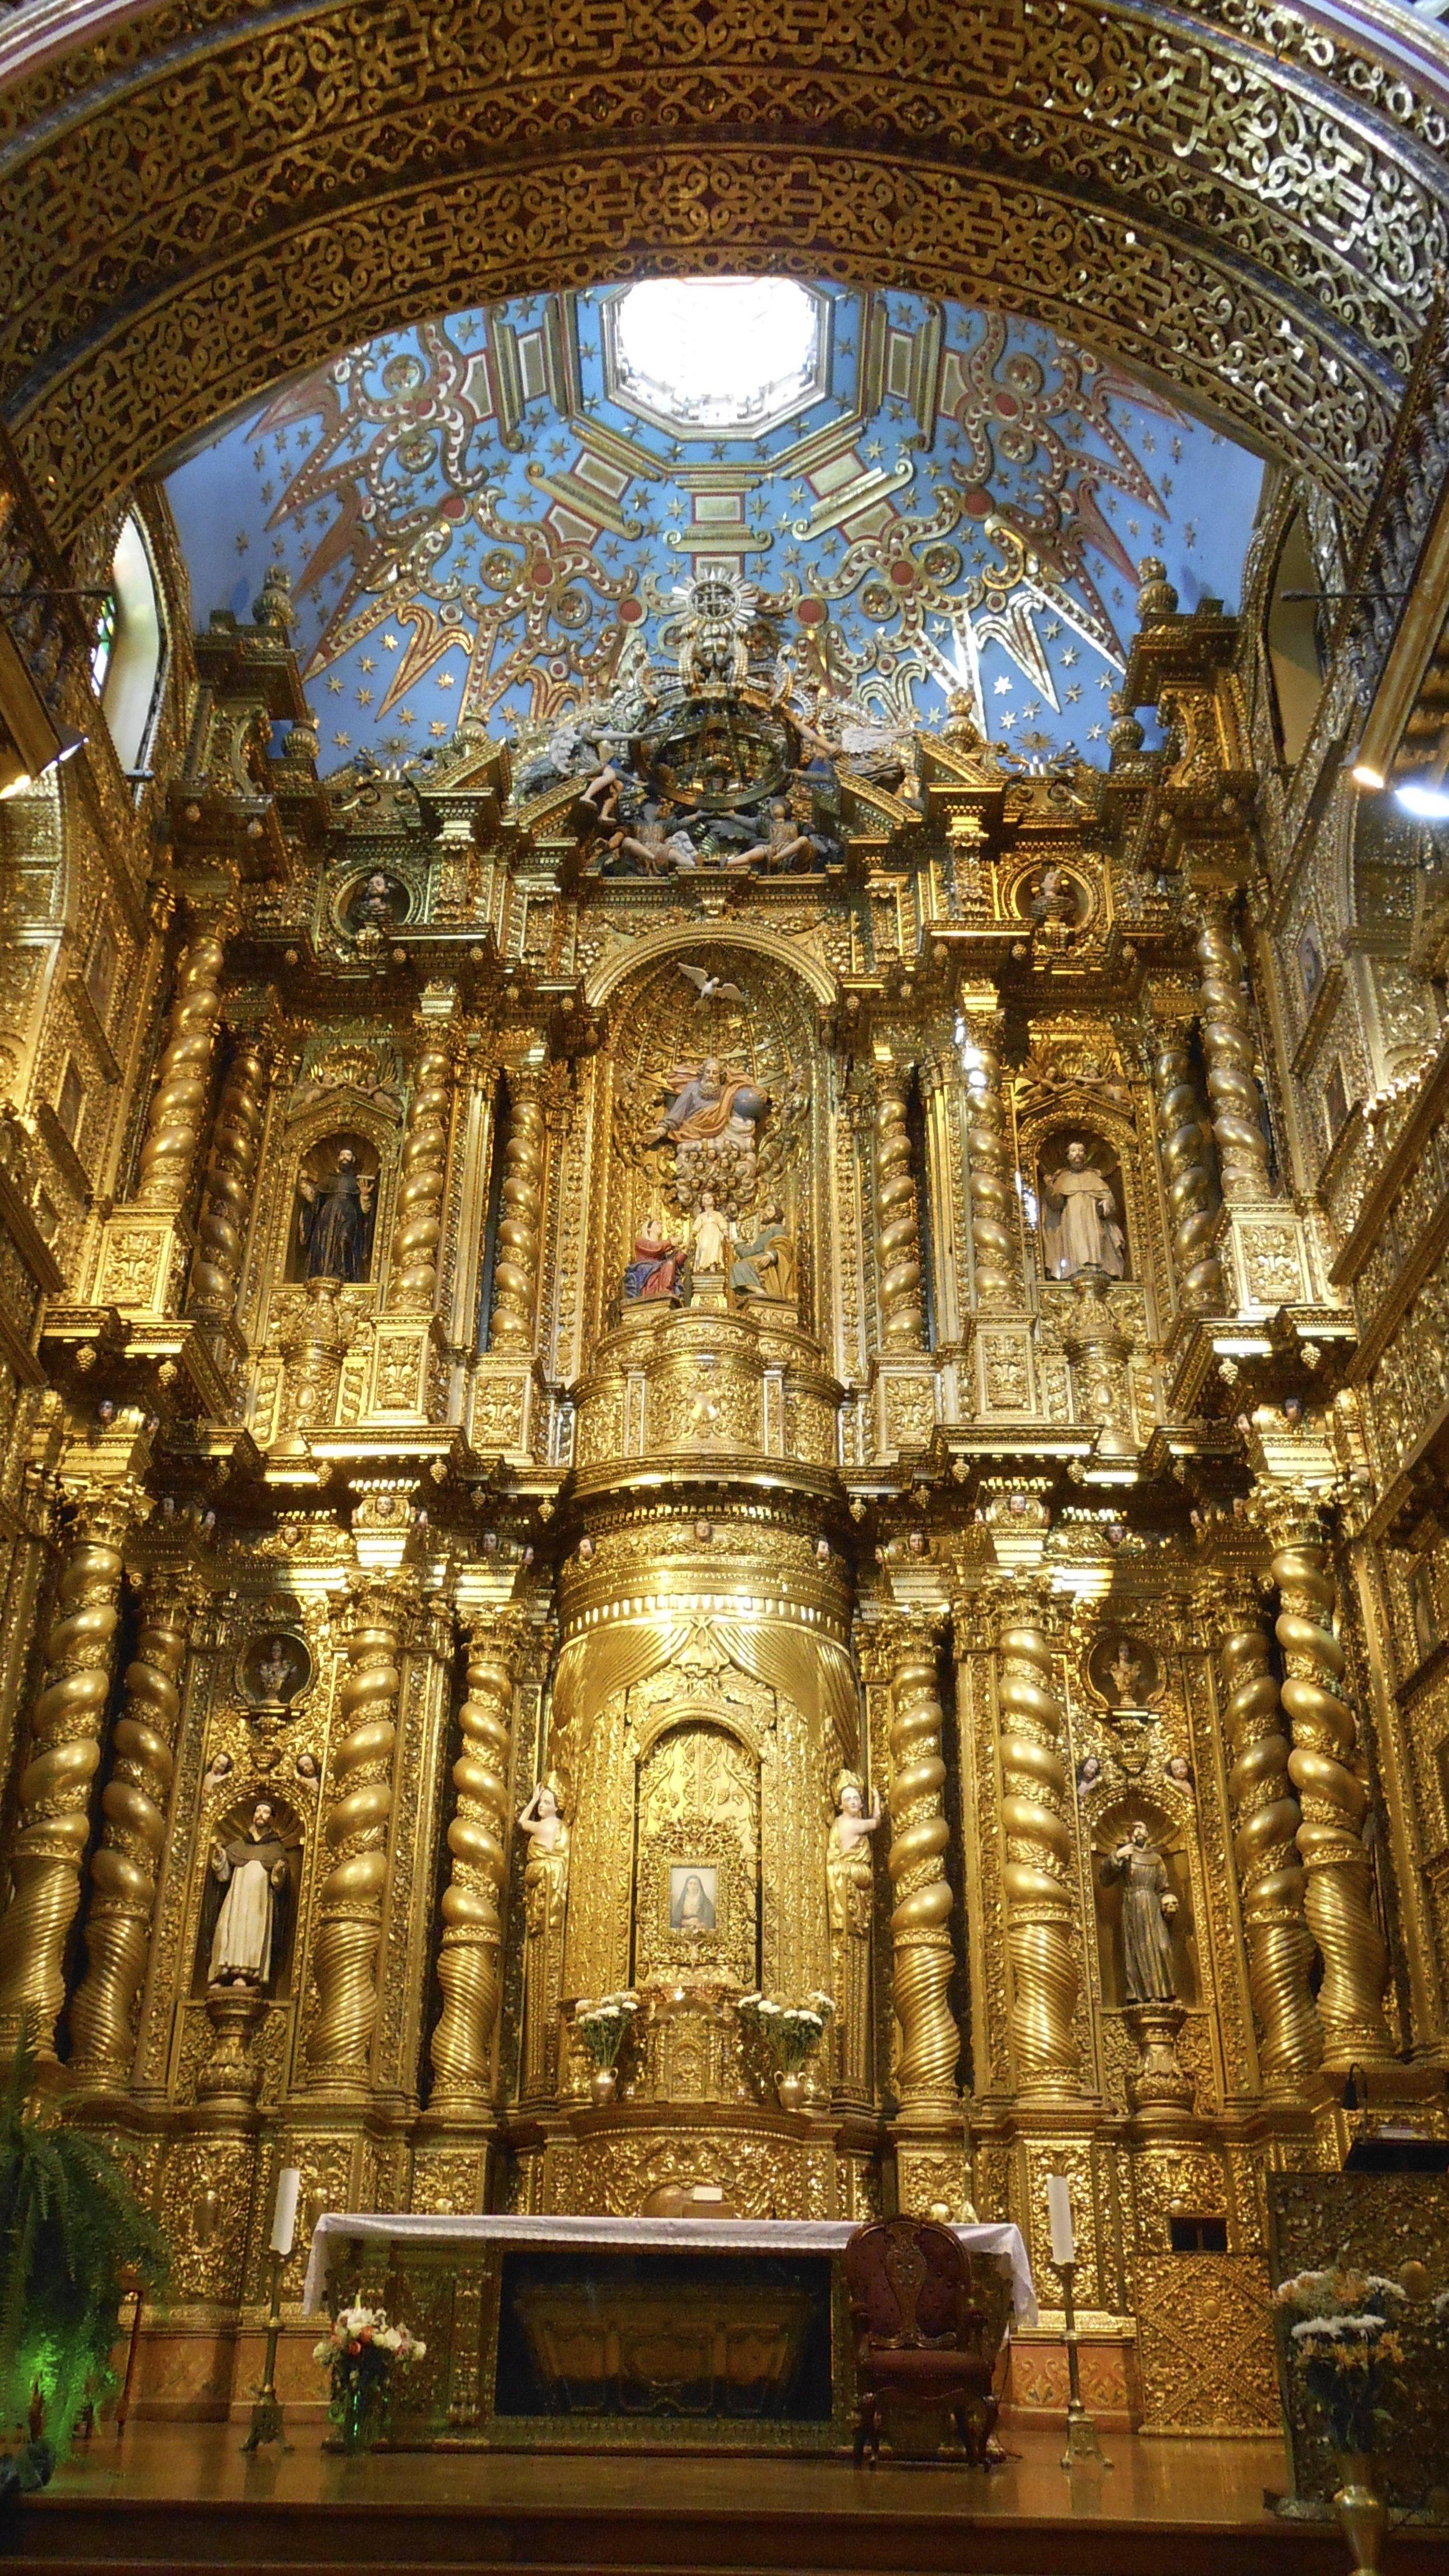 church-of-the-society-of-jesus-202158.jpg